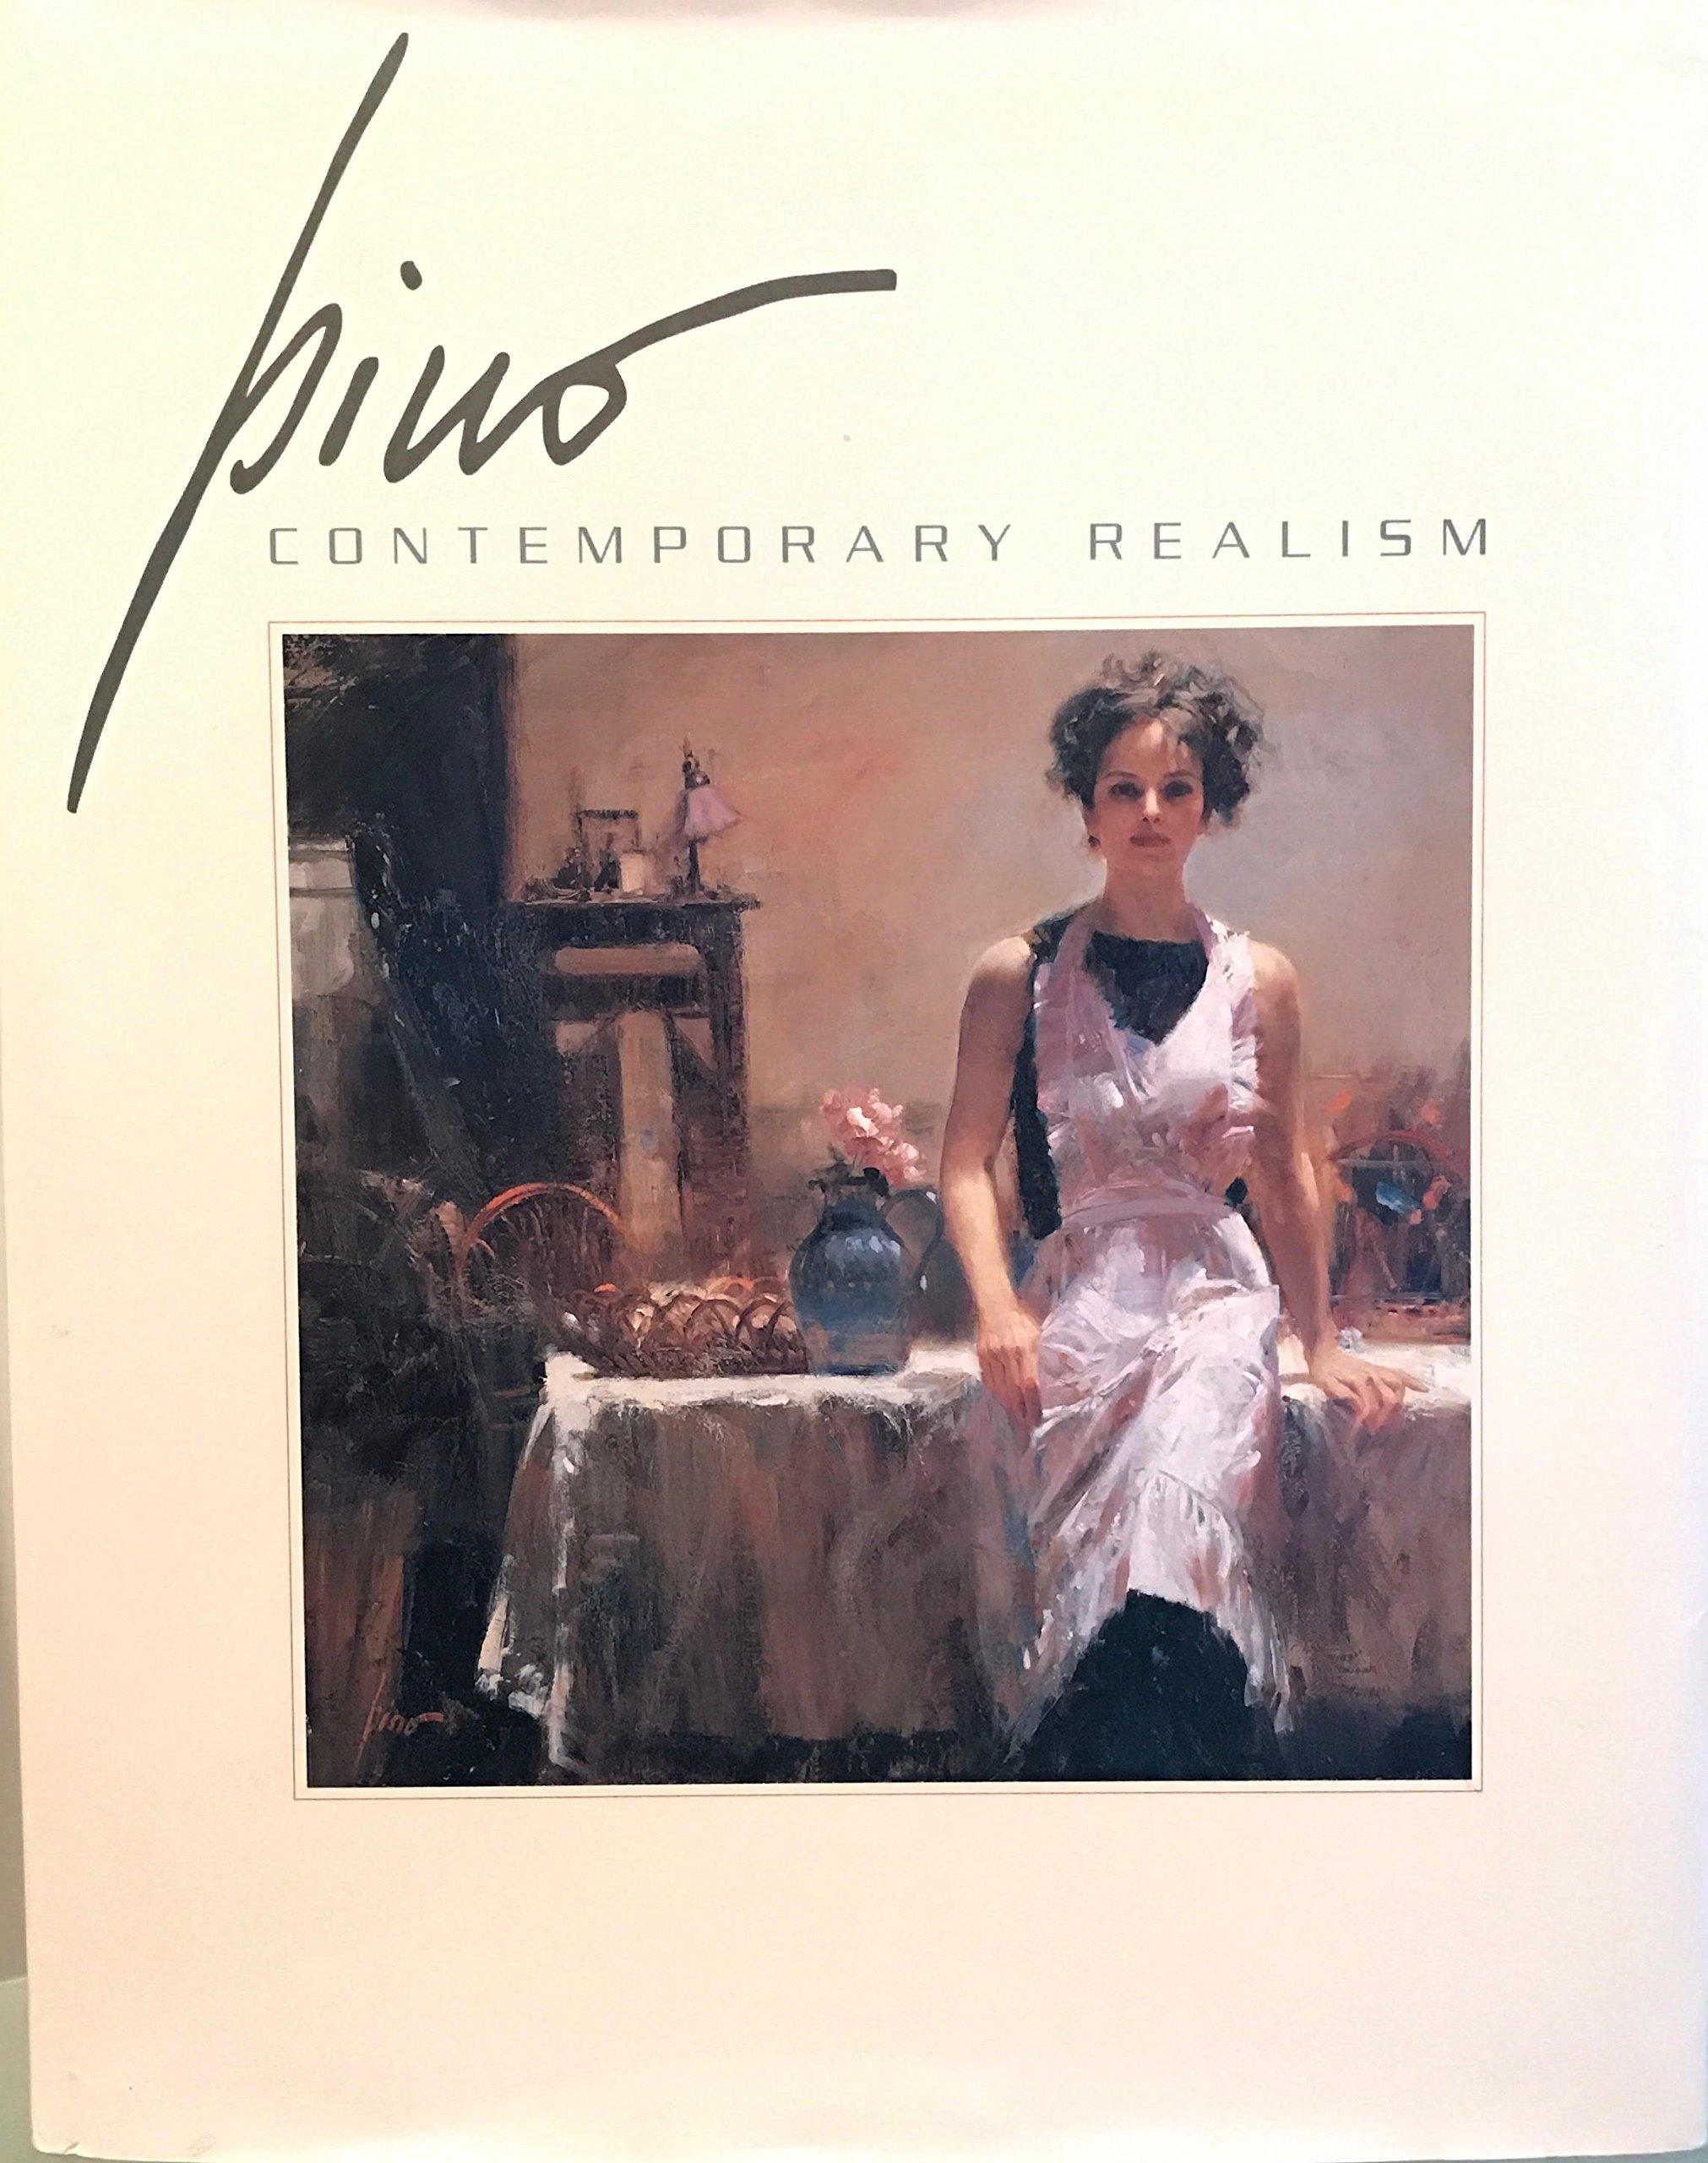 Download Pino: Contemporary Realism ebook